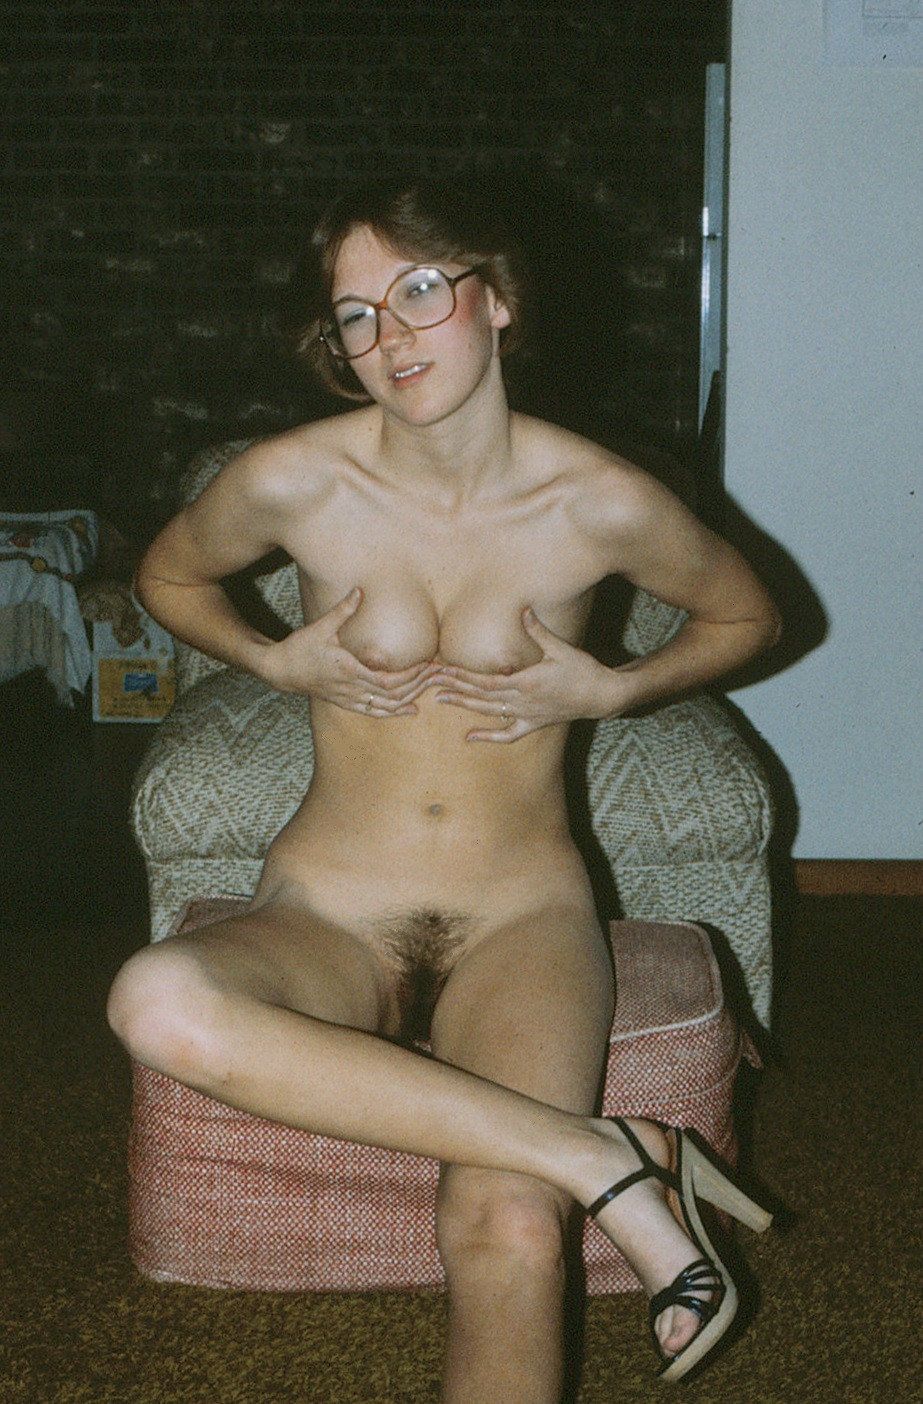 Bisexual woman web site